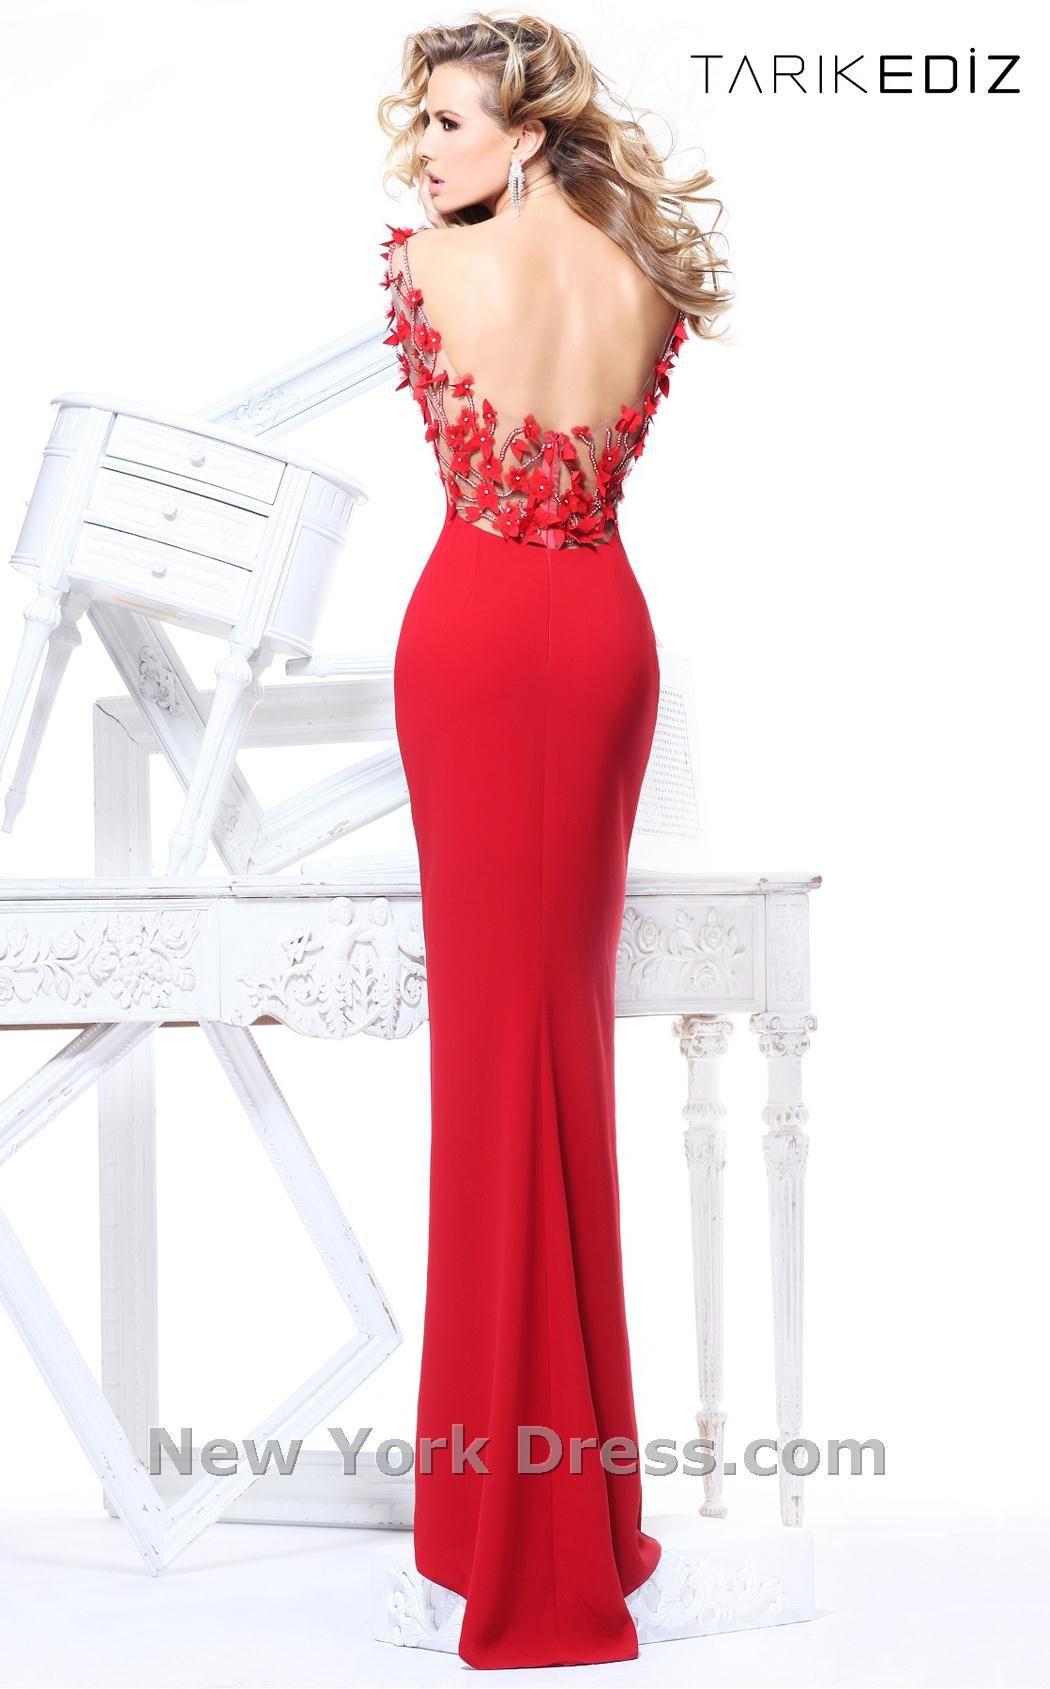 Tarik ediz miniaturas evening dresses pinterest elegant